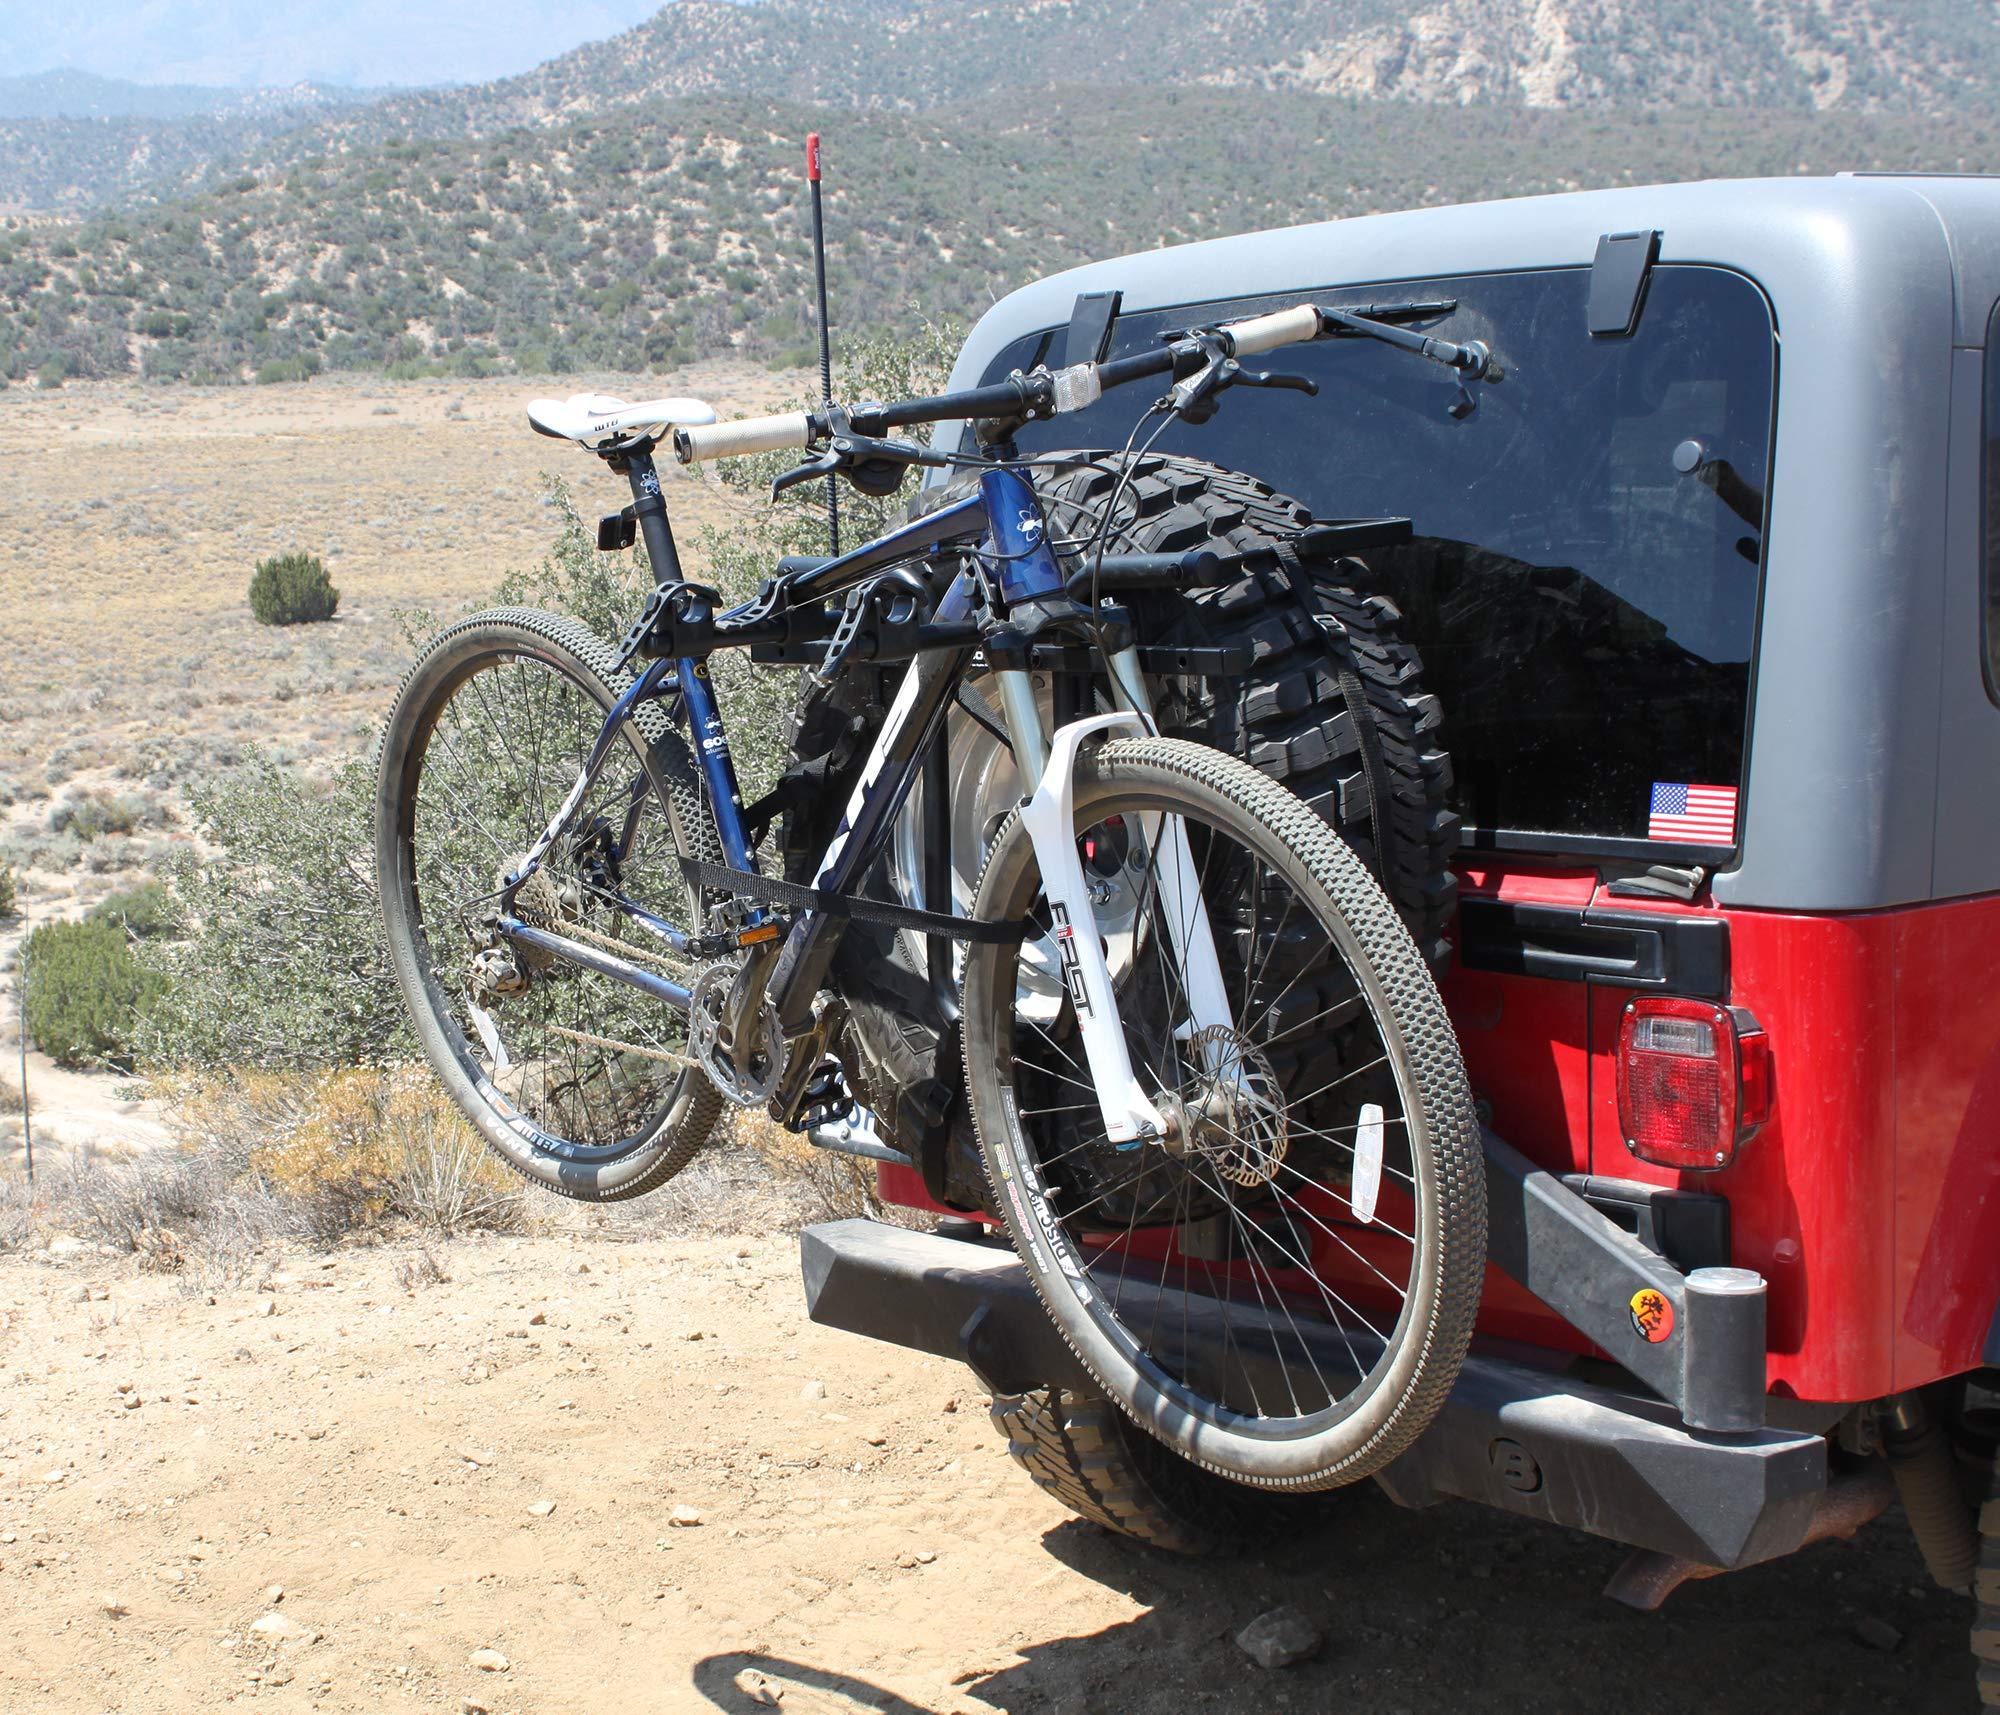 Hollywood Racks SR1 Spare Tire Rack 2 Bike Spare Tire Mount Rack rrba s